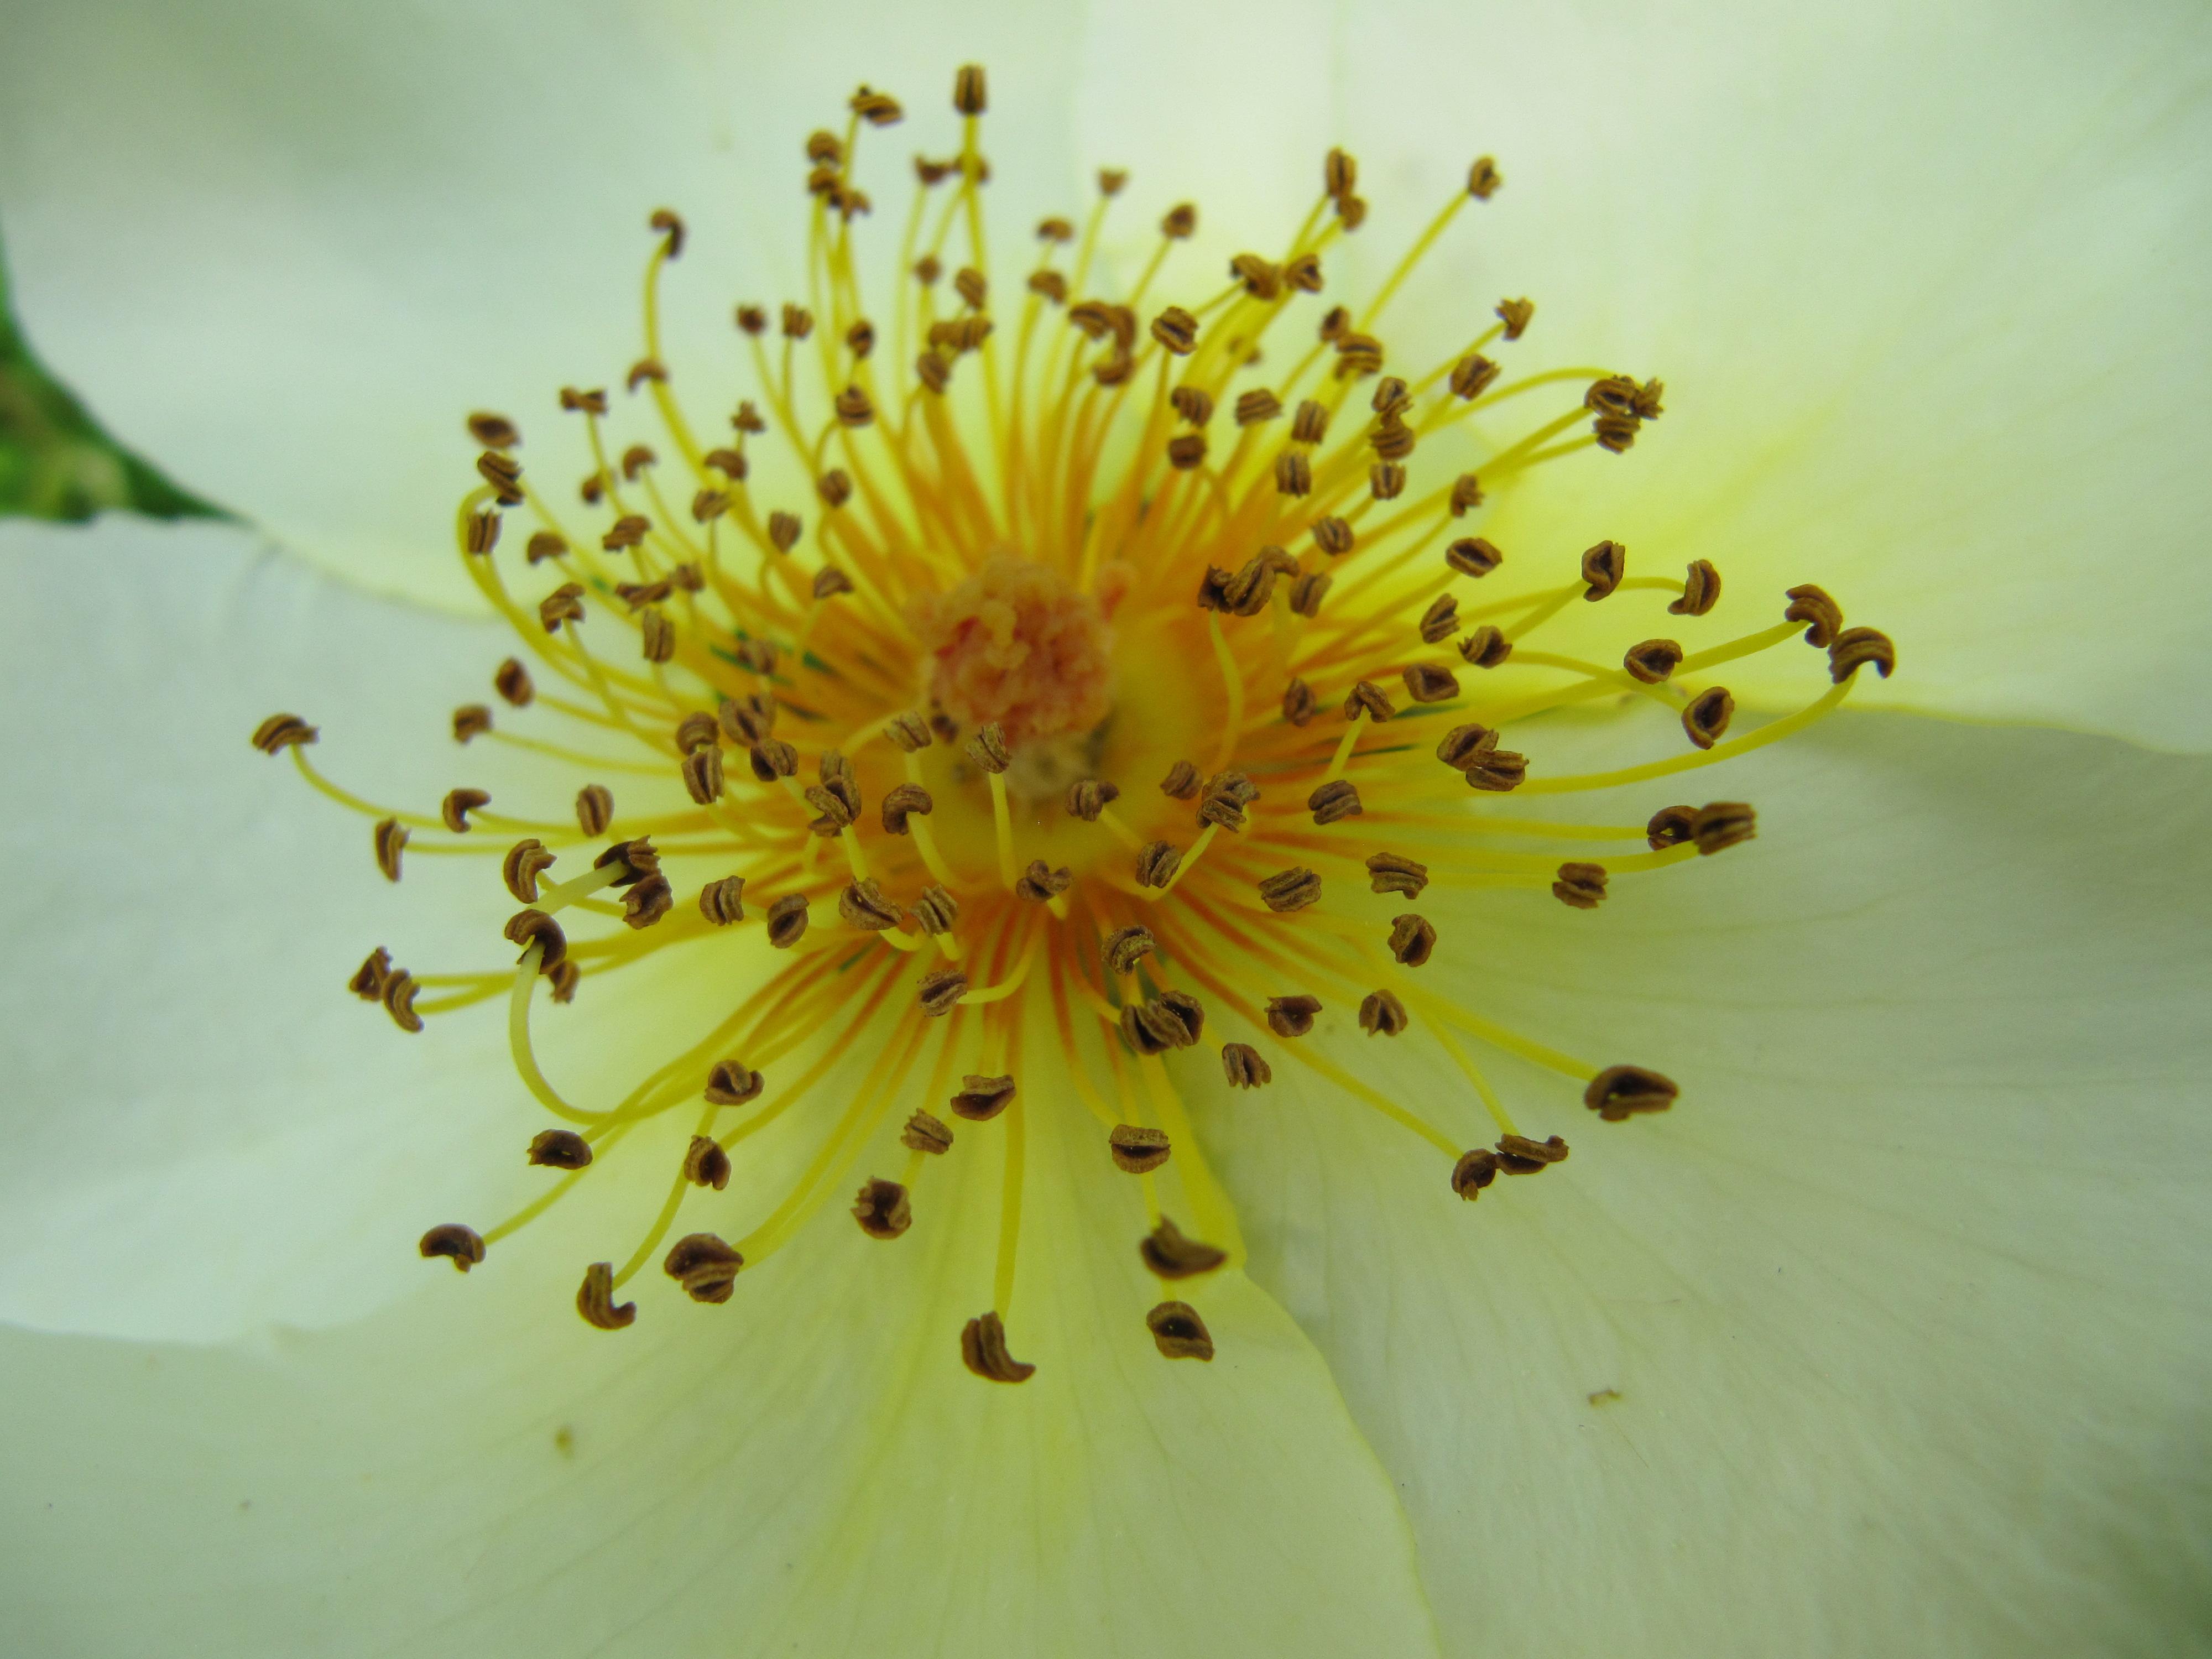 file fleur blanche pistil jaune jpg wikimedia commons. Black Bedroom Furniture Sets. Home Design Ideas